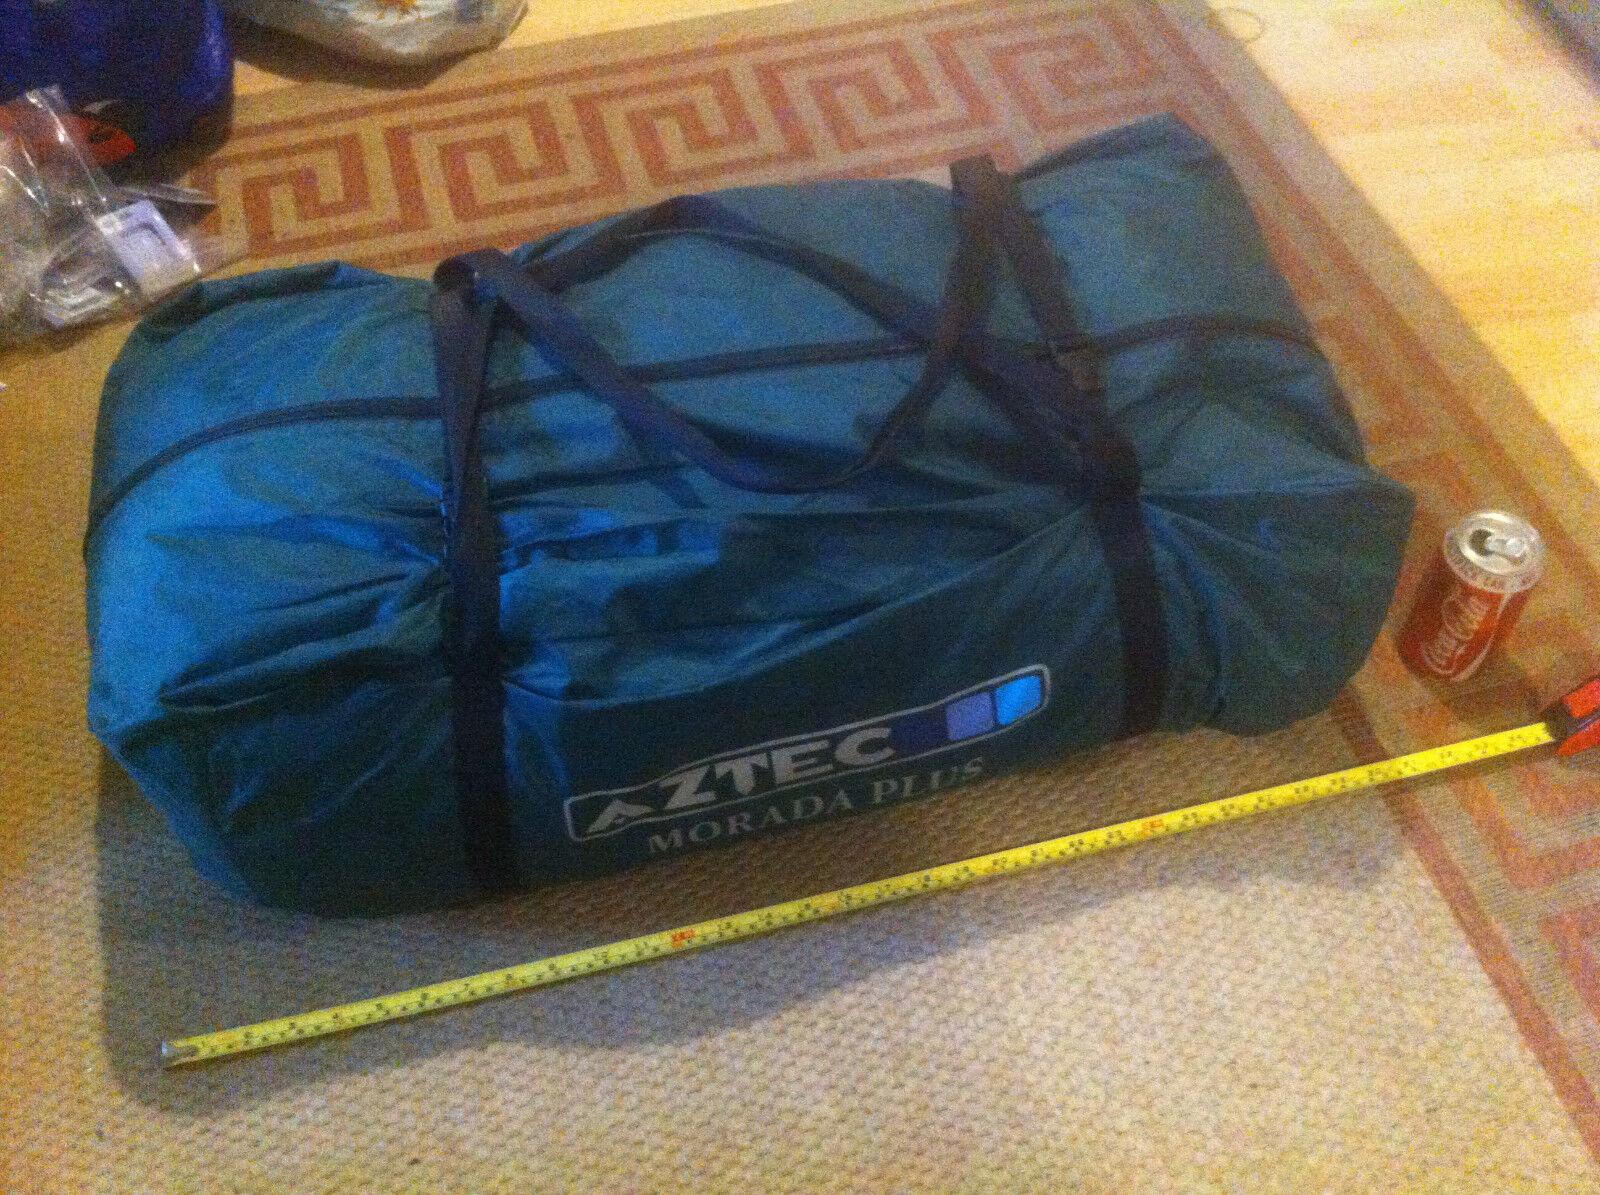 Aztec Morada Plus Dome Tent Fire Retardant 19kg